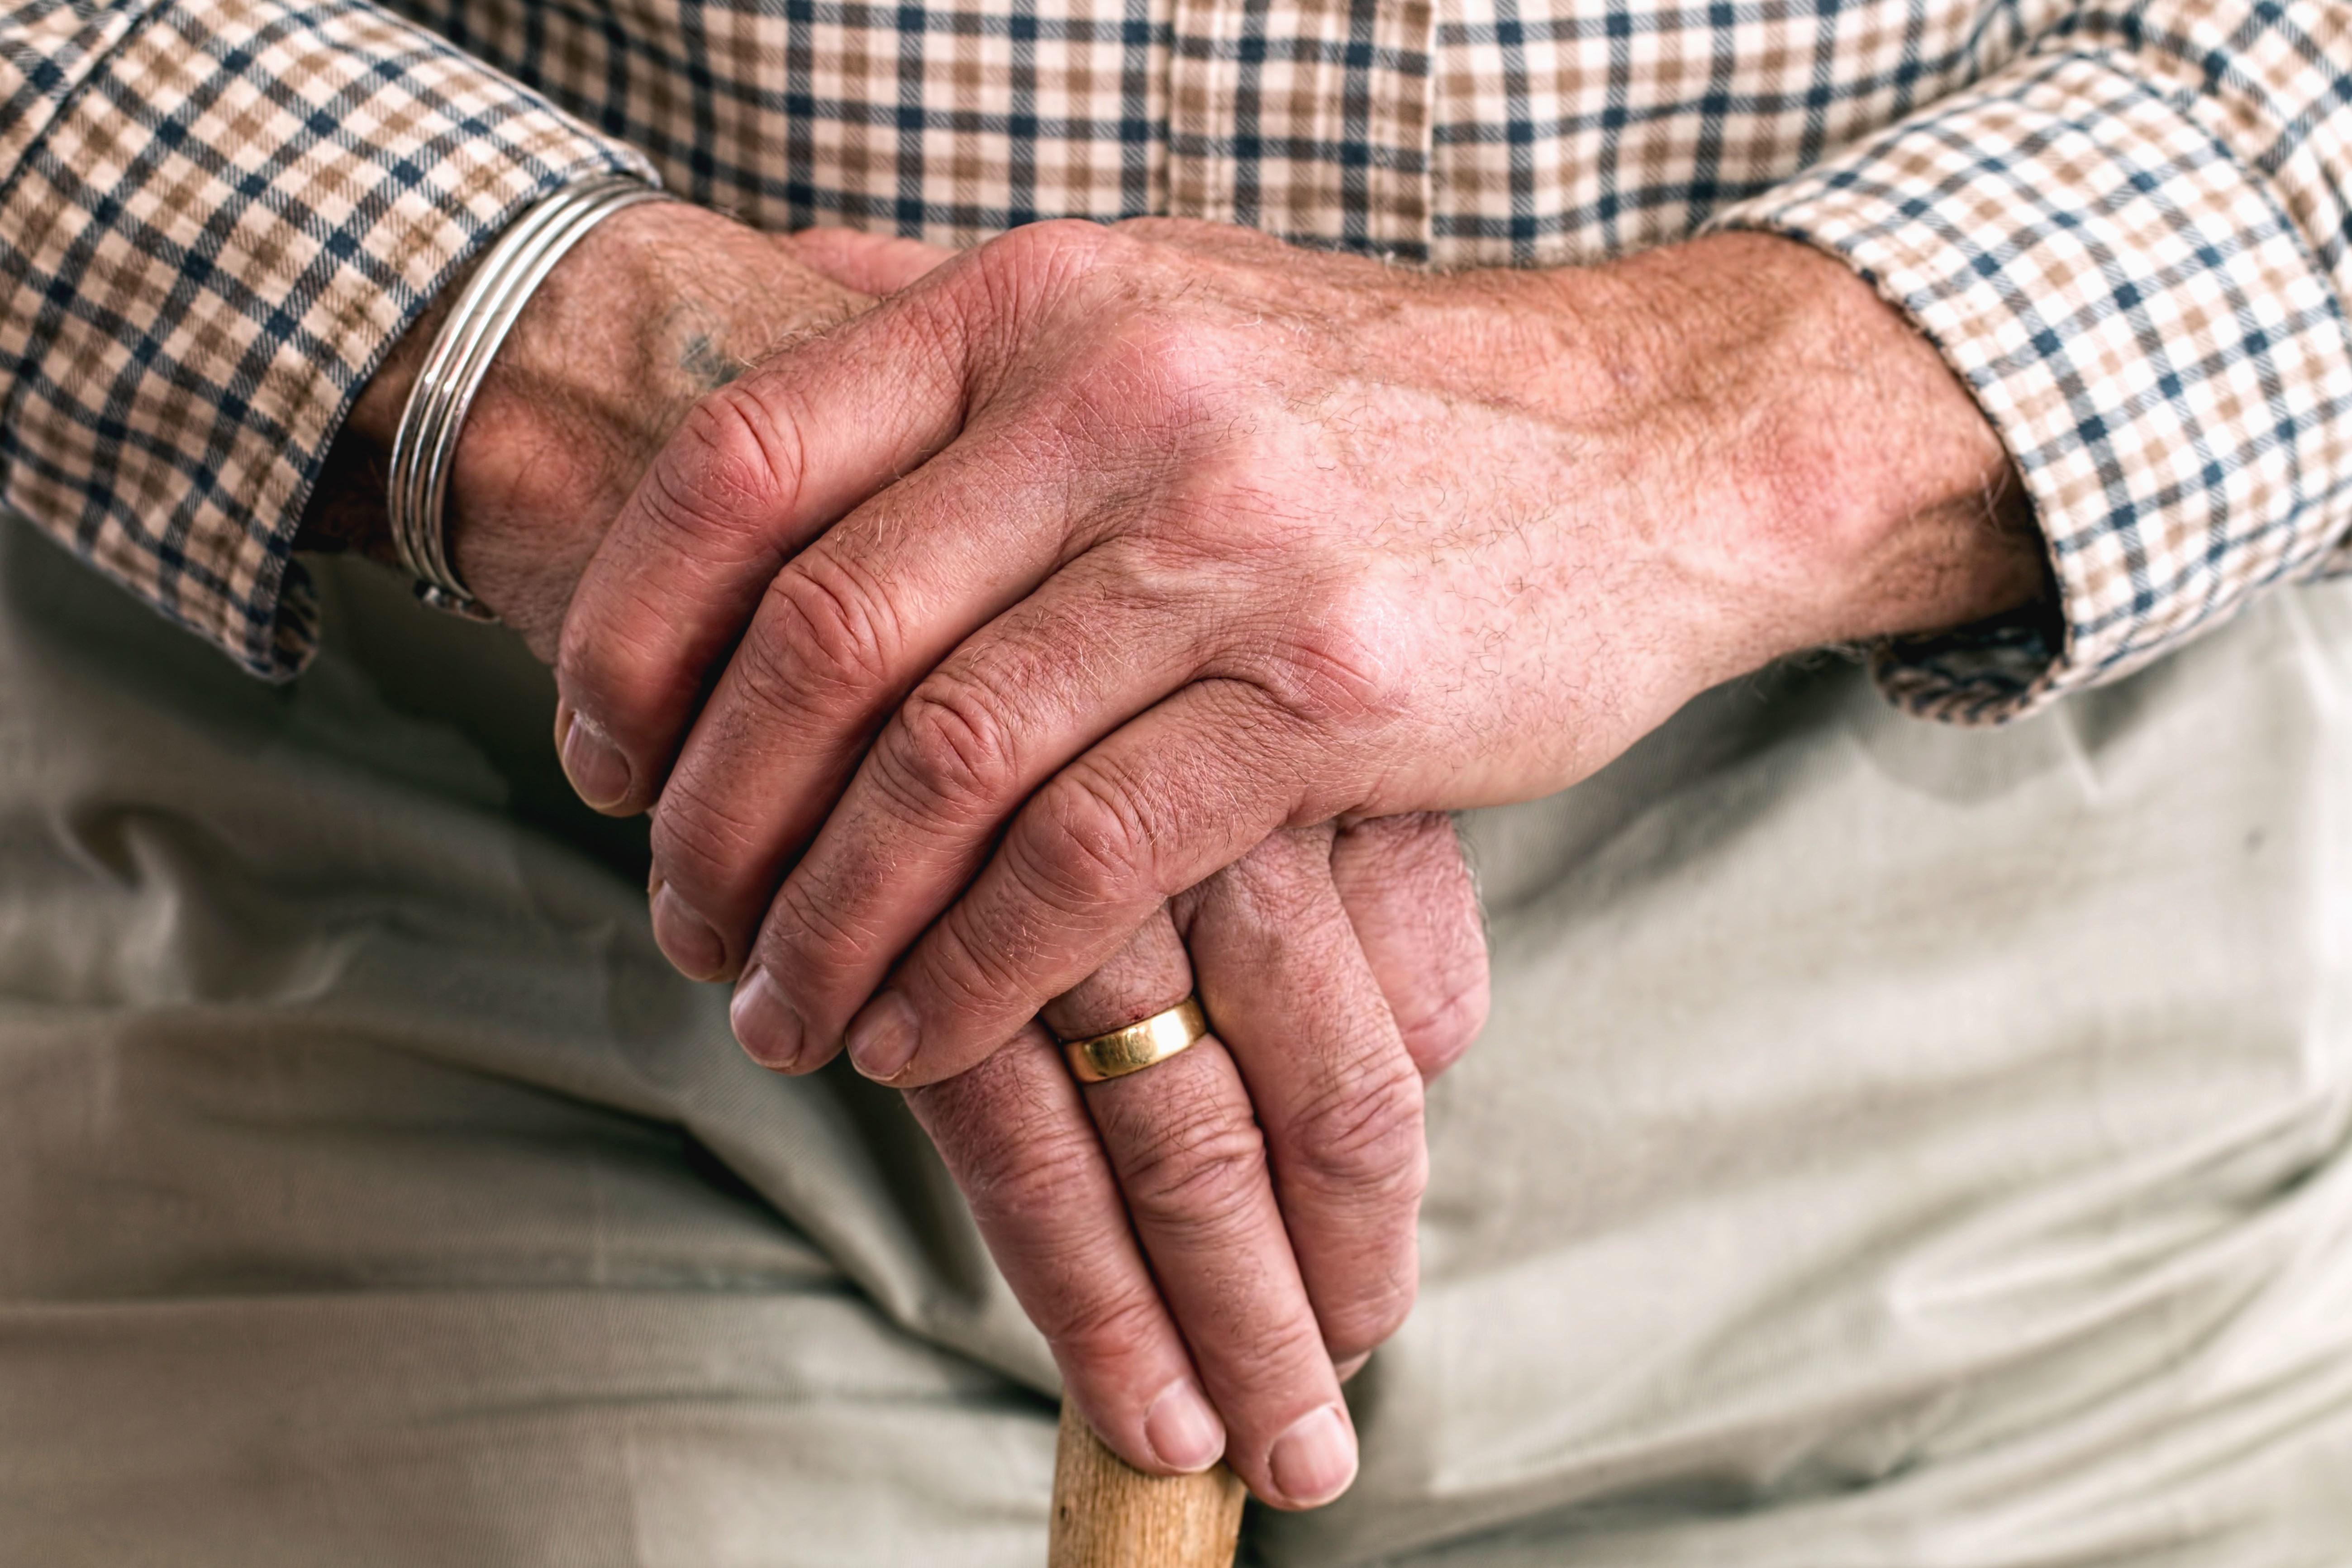 Free picture: man, hand, wedding ring, stick, shirt